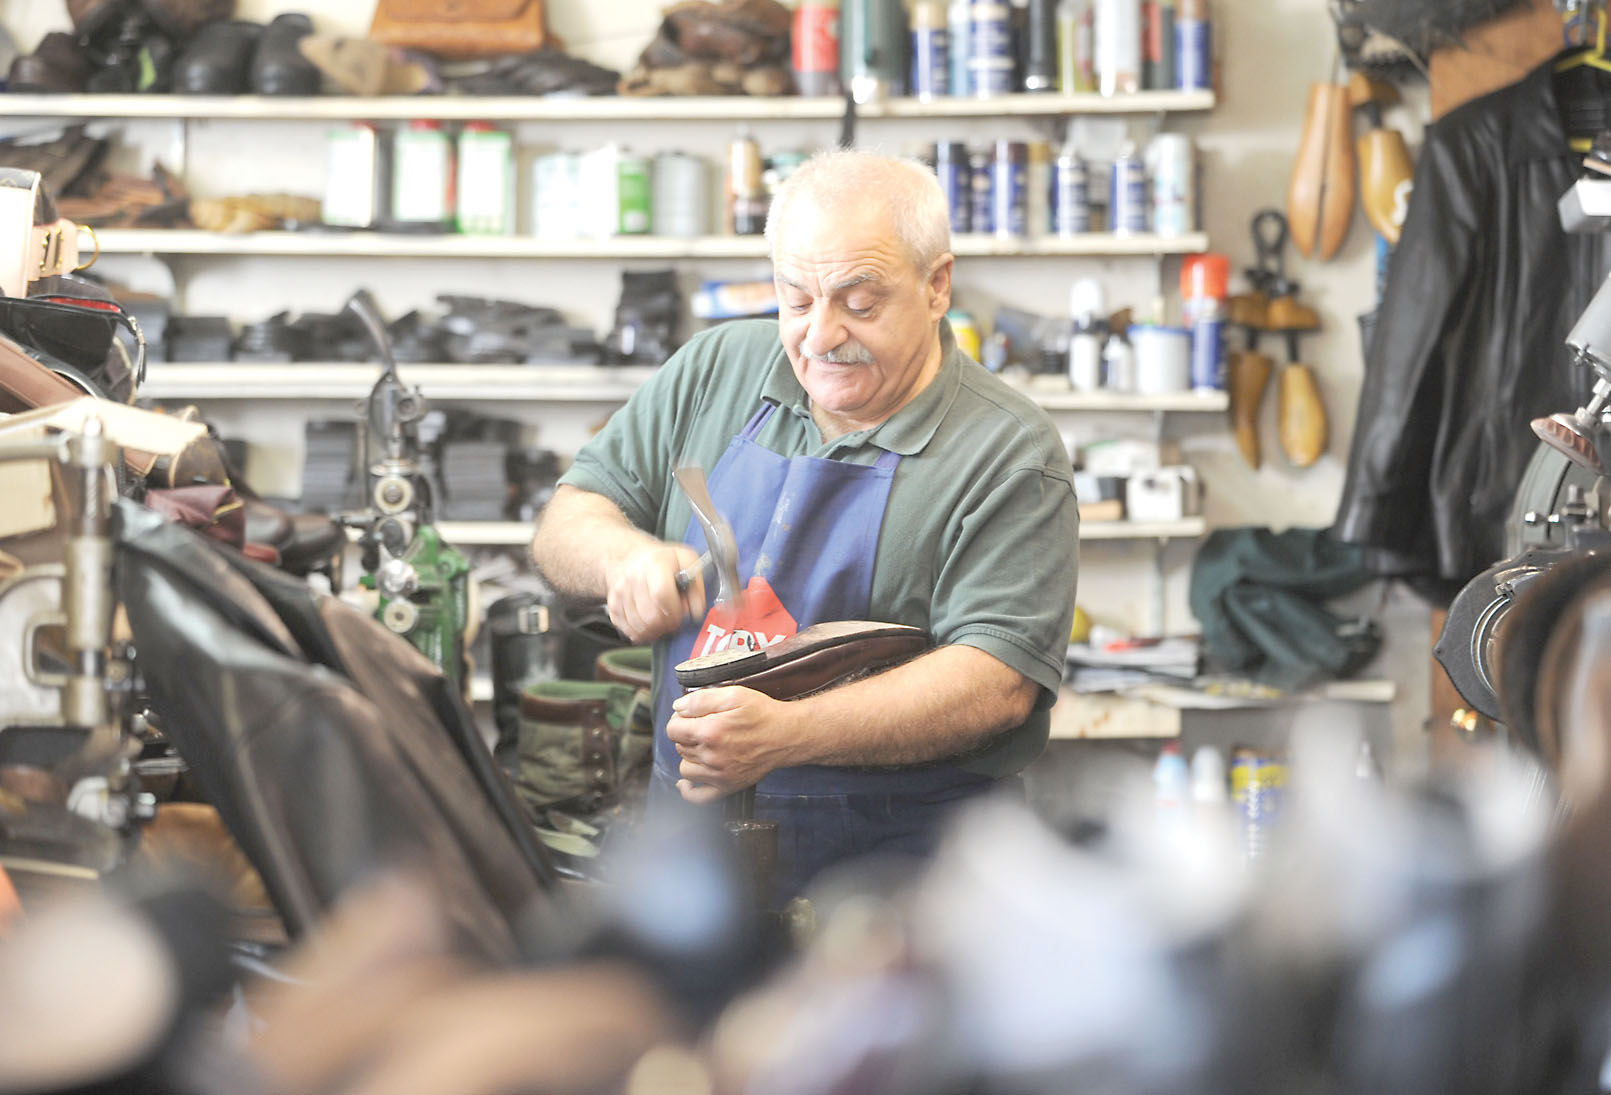 Shoe repairman helps customers' soles